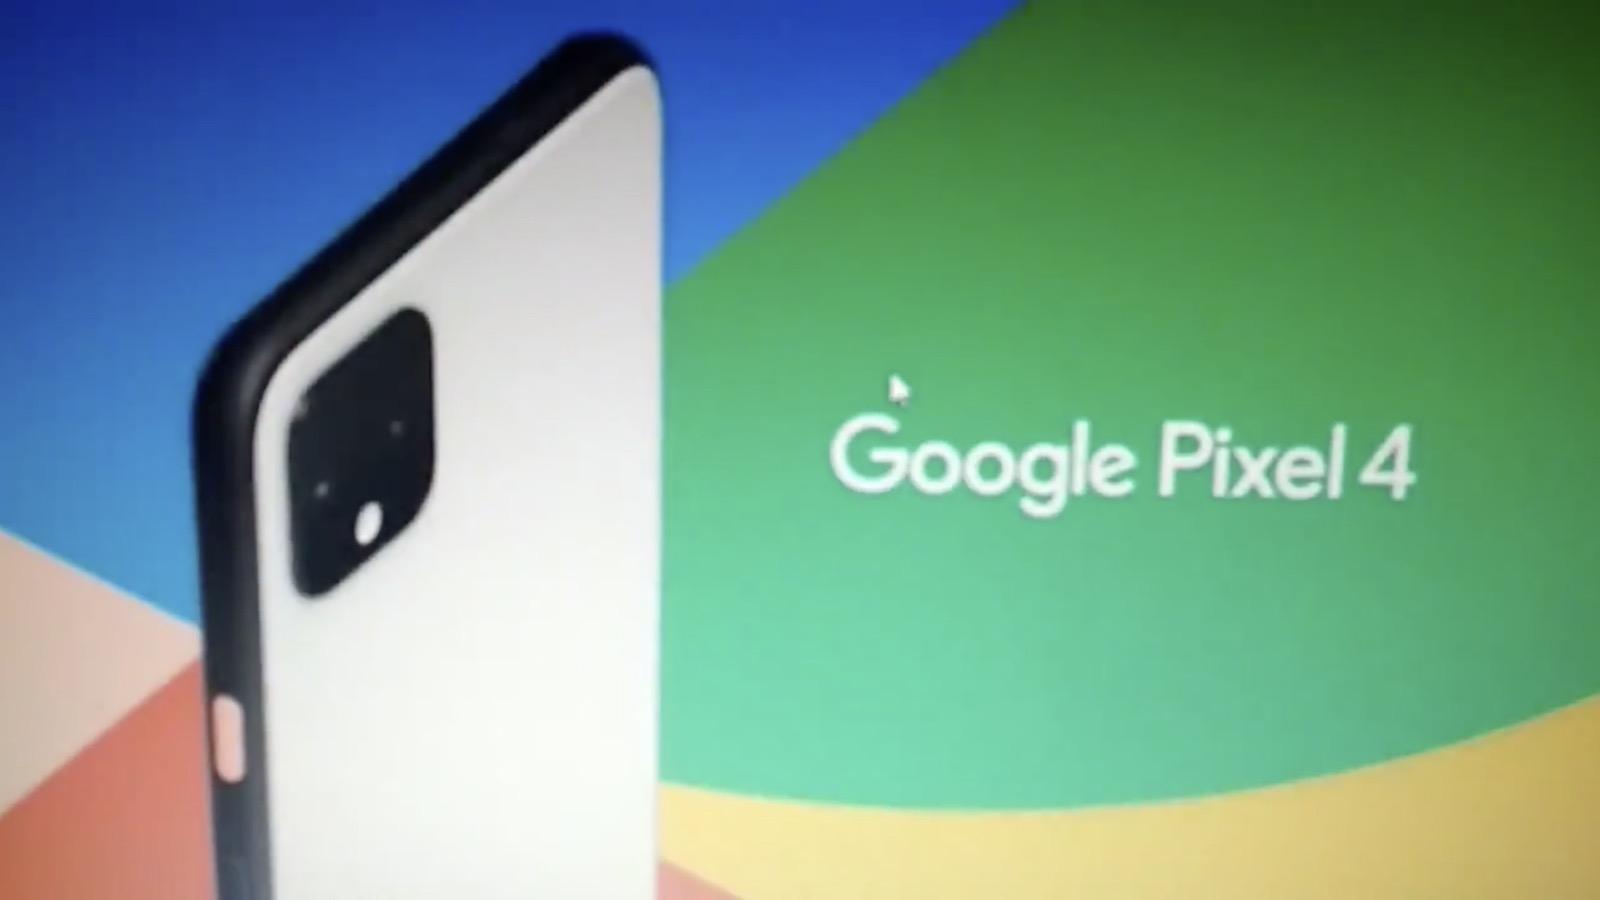 「Pixel 4」、発表前にテレビCM流出。次世代Googleアシスタント、星空撮影に対応か